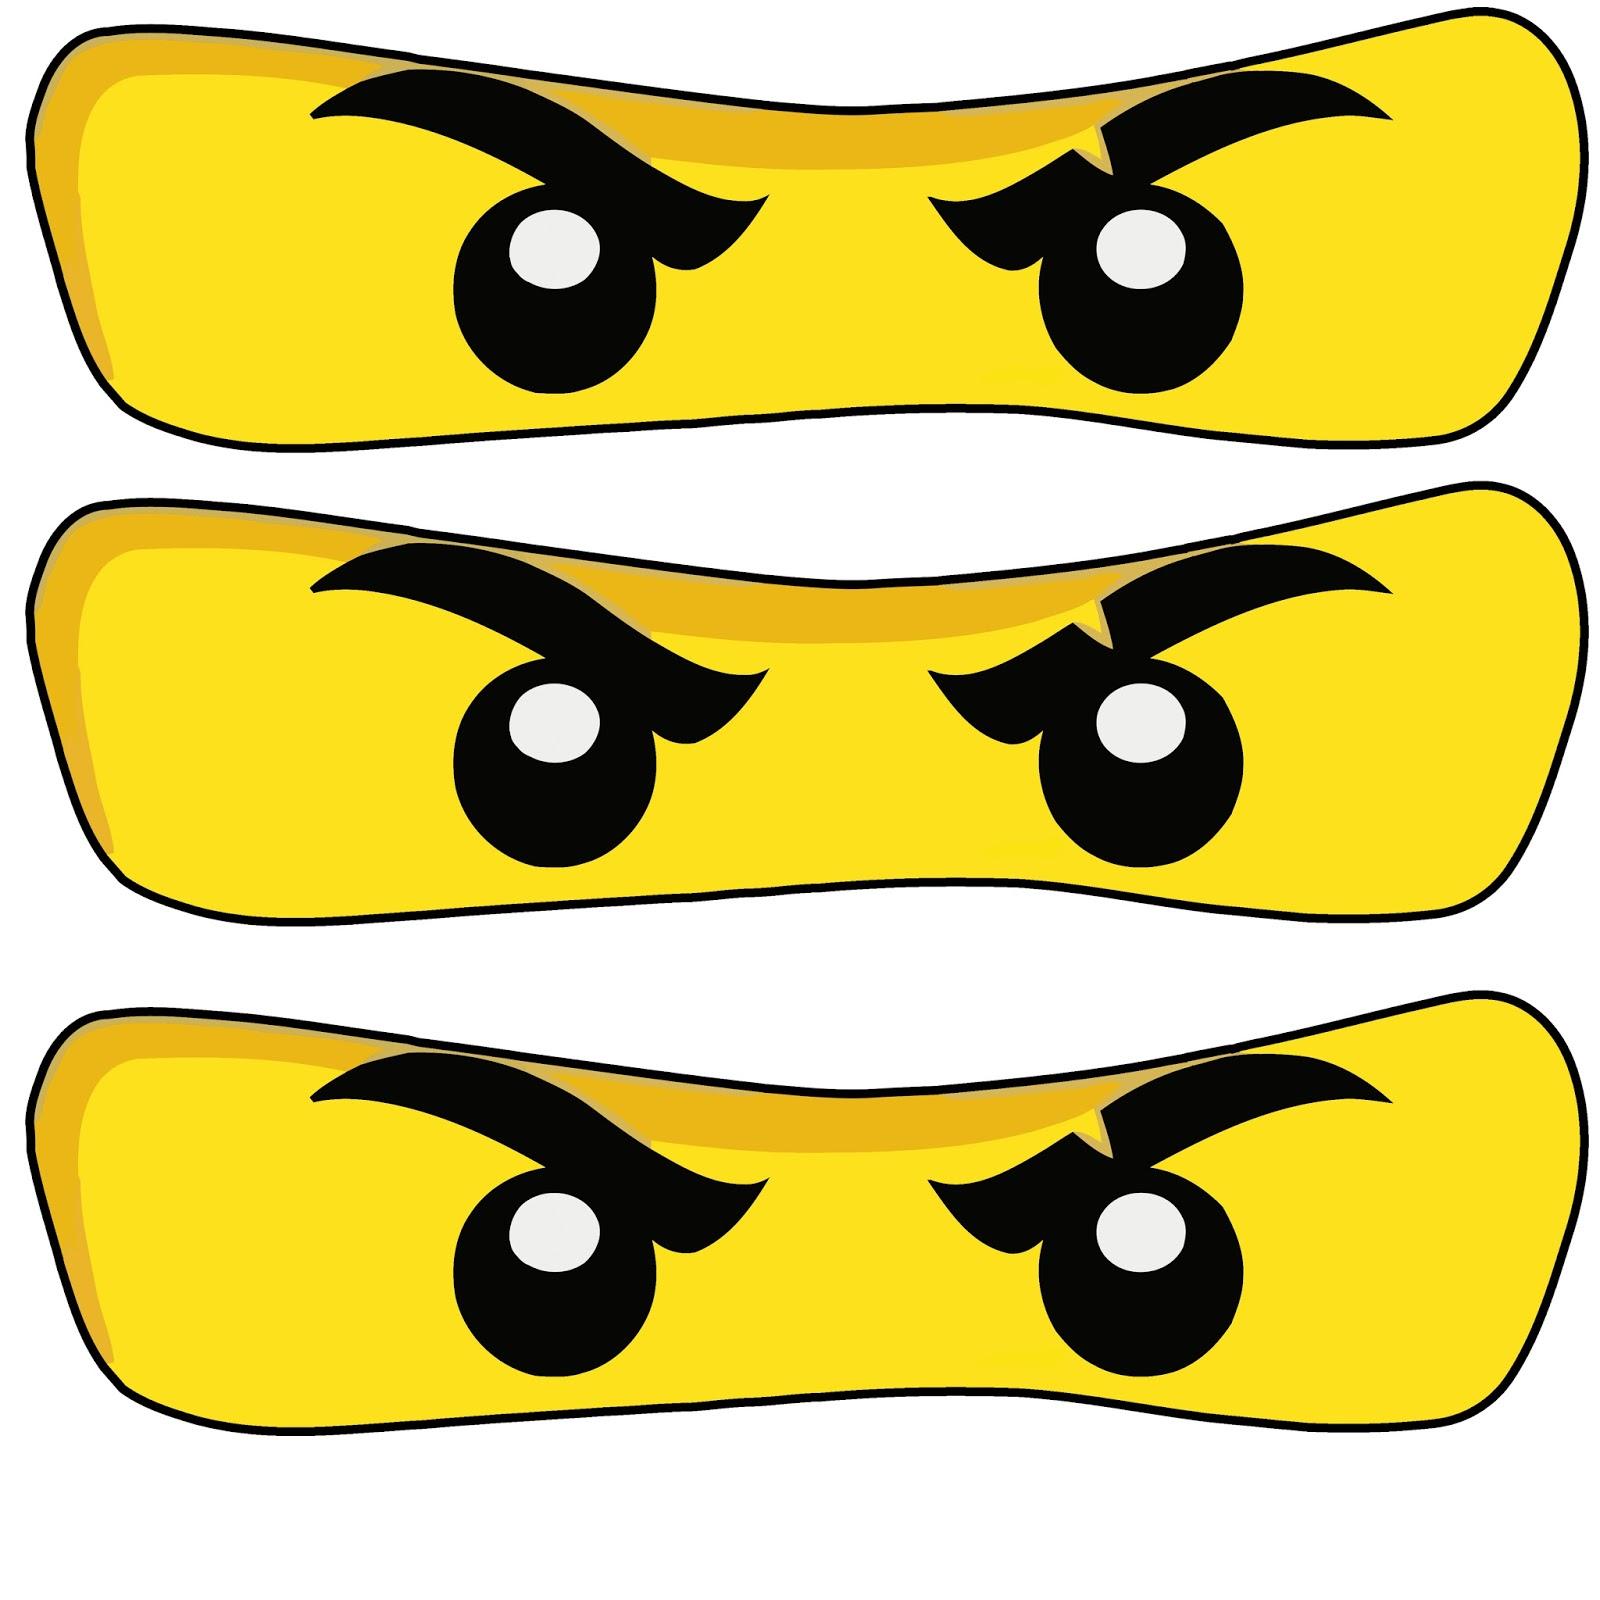 ninjago malvorlagen augen anleitung  aiquruguay